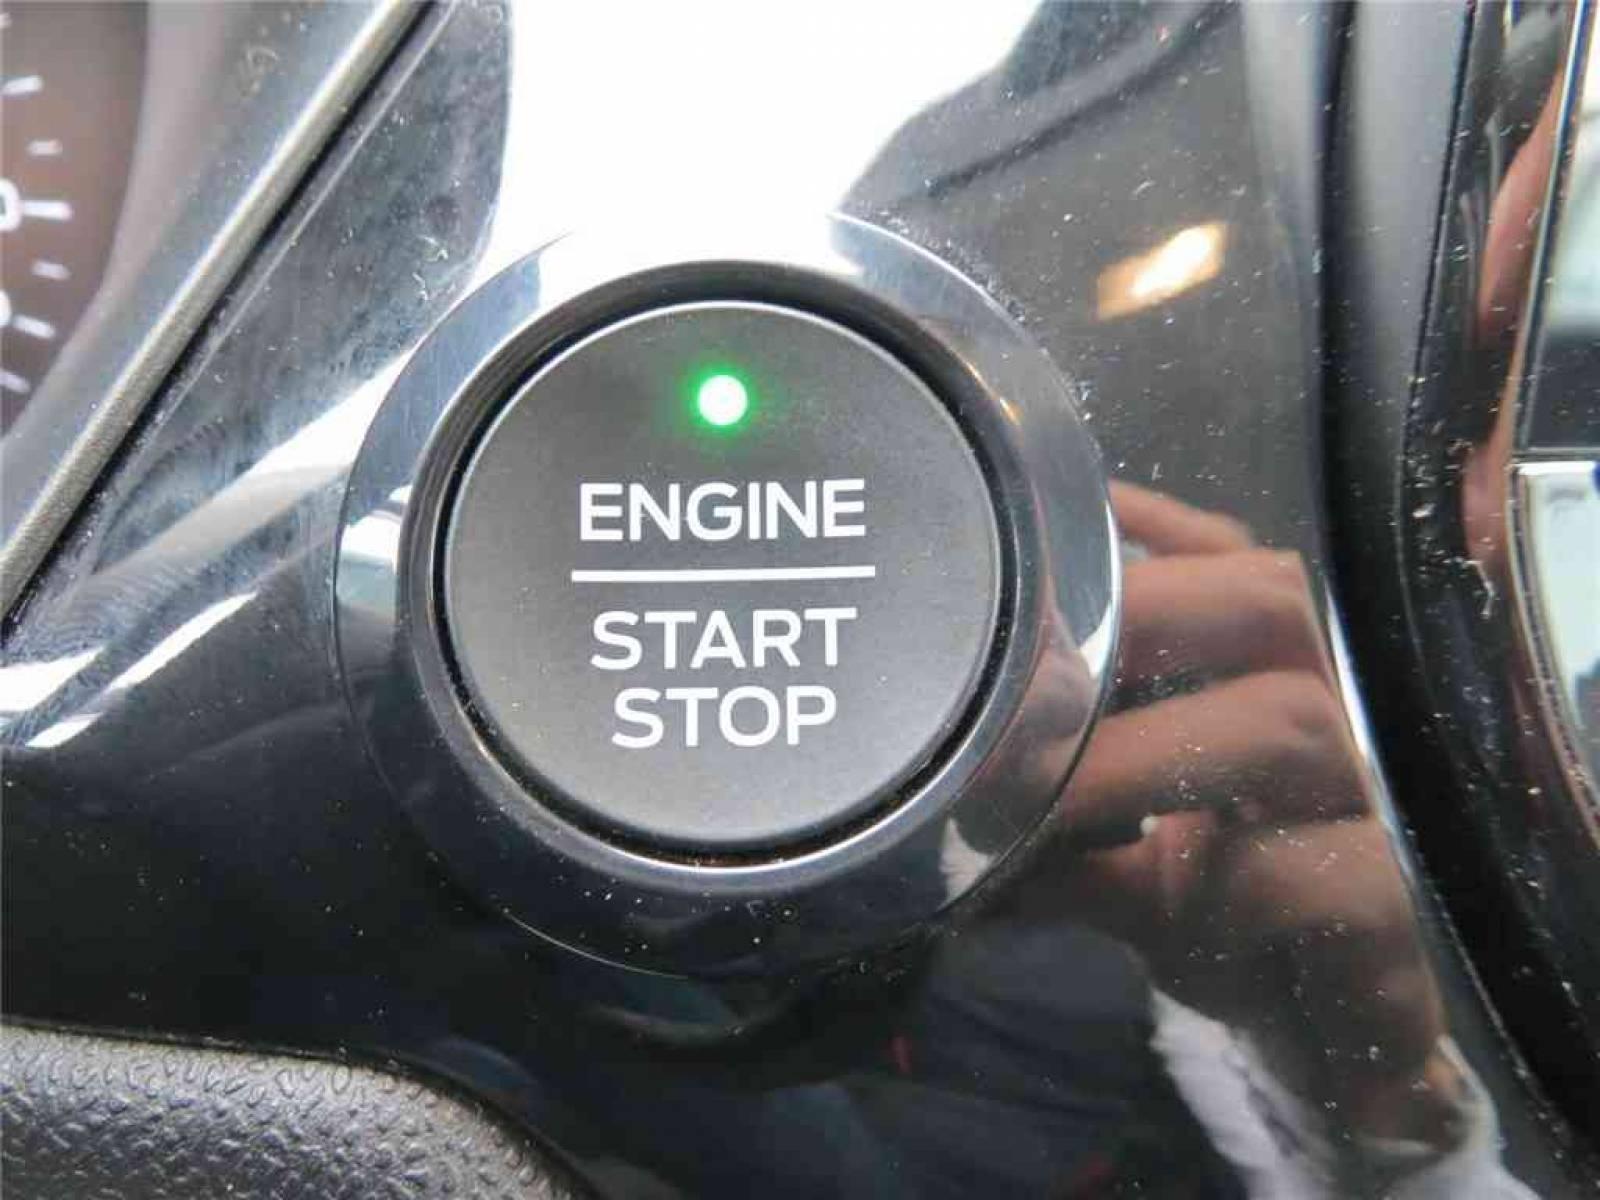 FORD Fiesta 1.0 EcoBoost 100 ch S&S BVM6 - véhicule d'occasion - Groupe Guillet - Opel Magicauto - Chalon-sur-Saône - 71380 - Saint-Marcel - 21